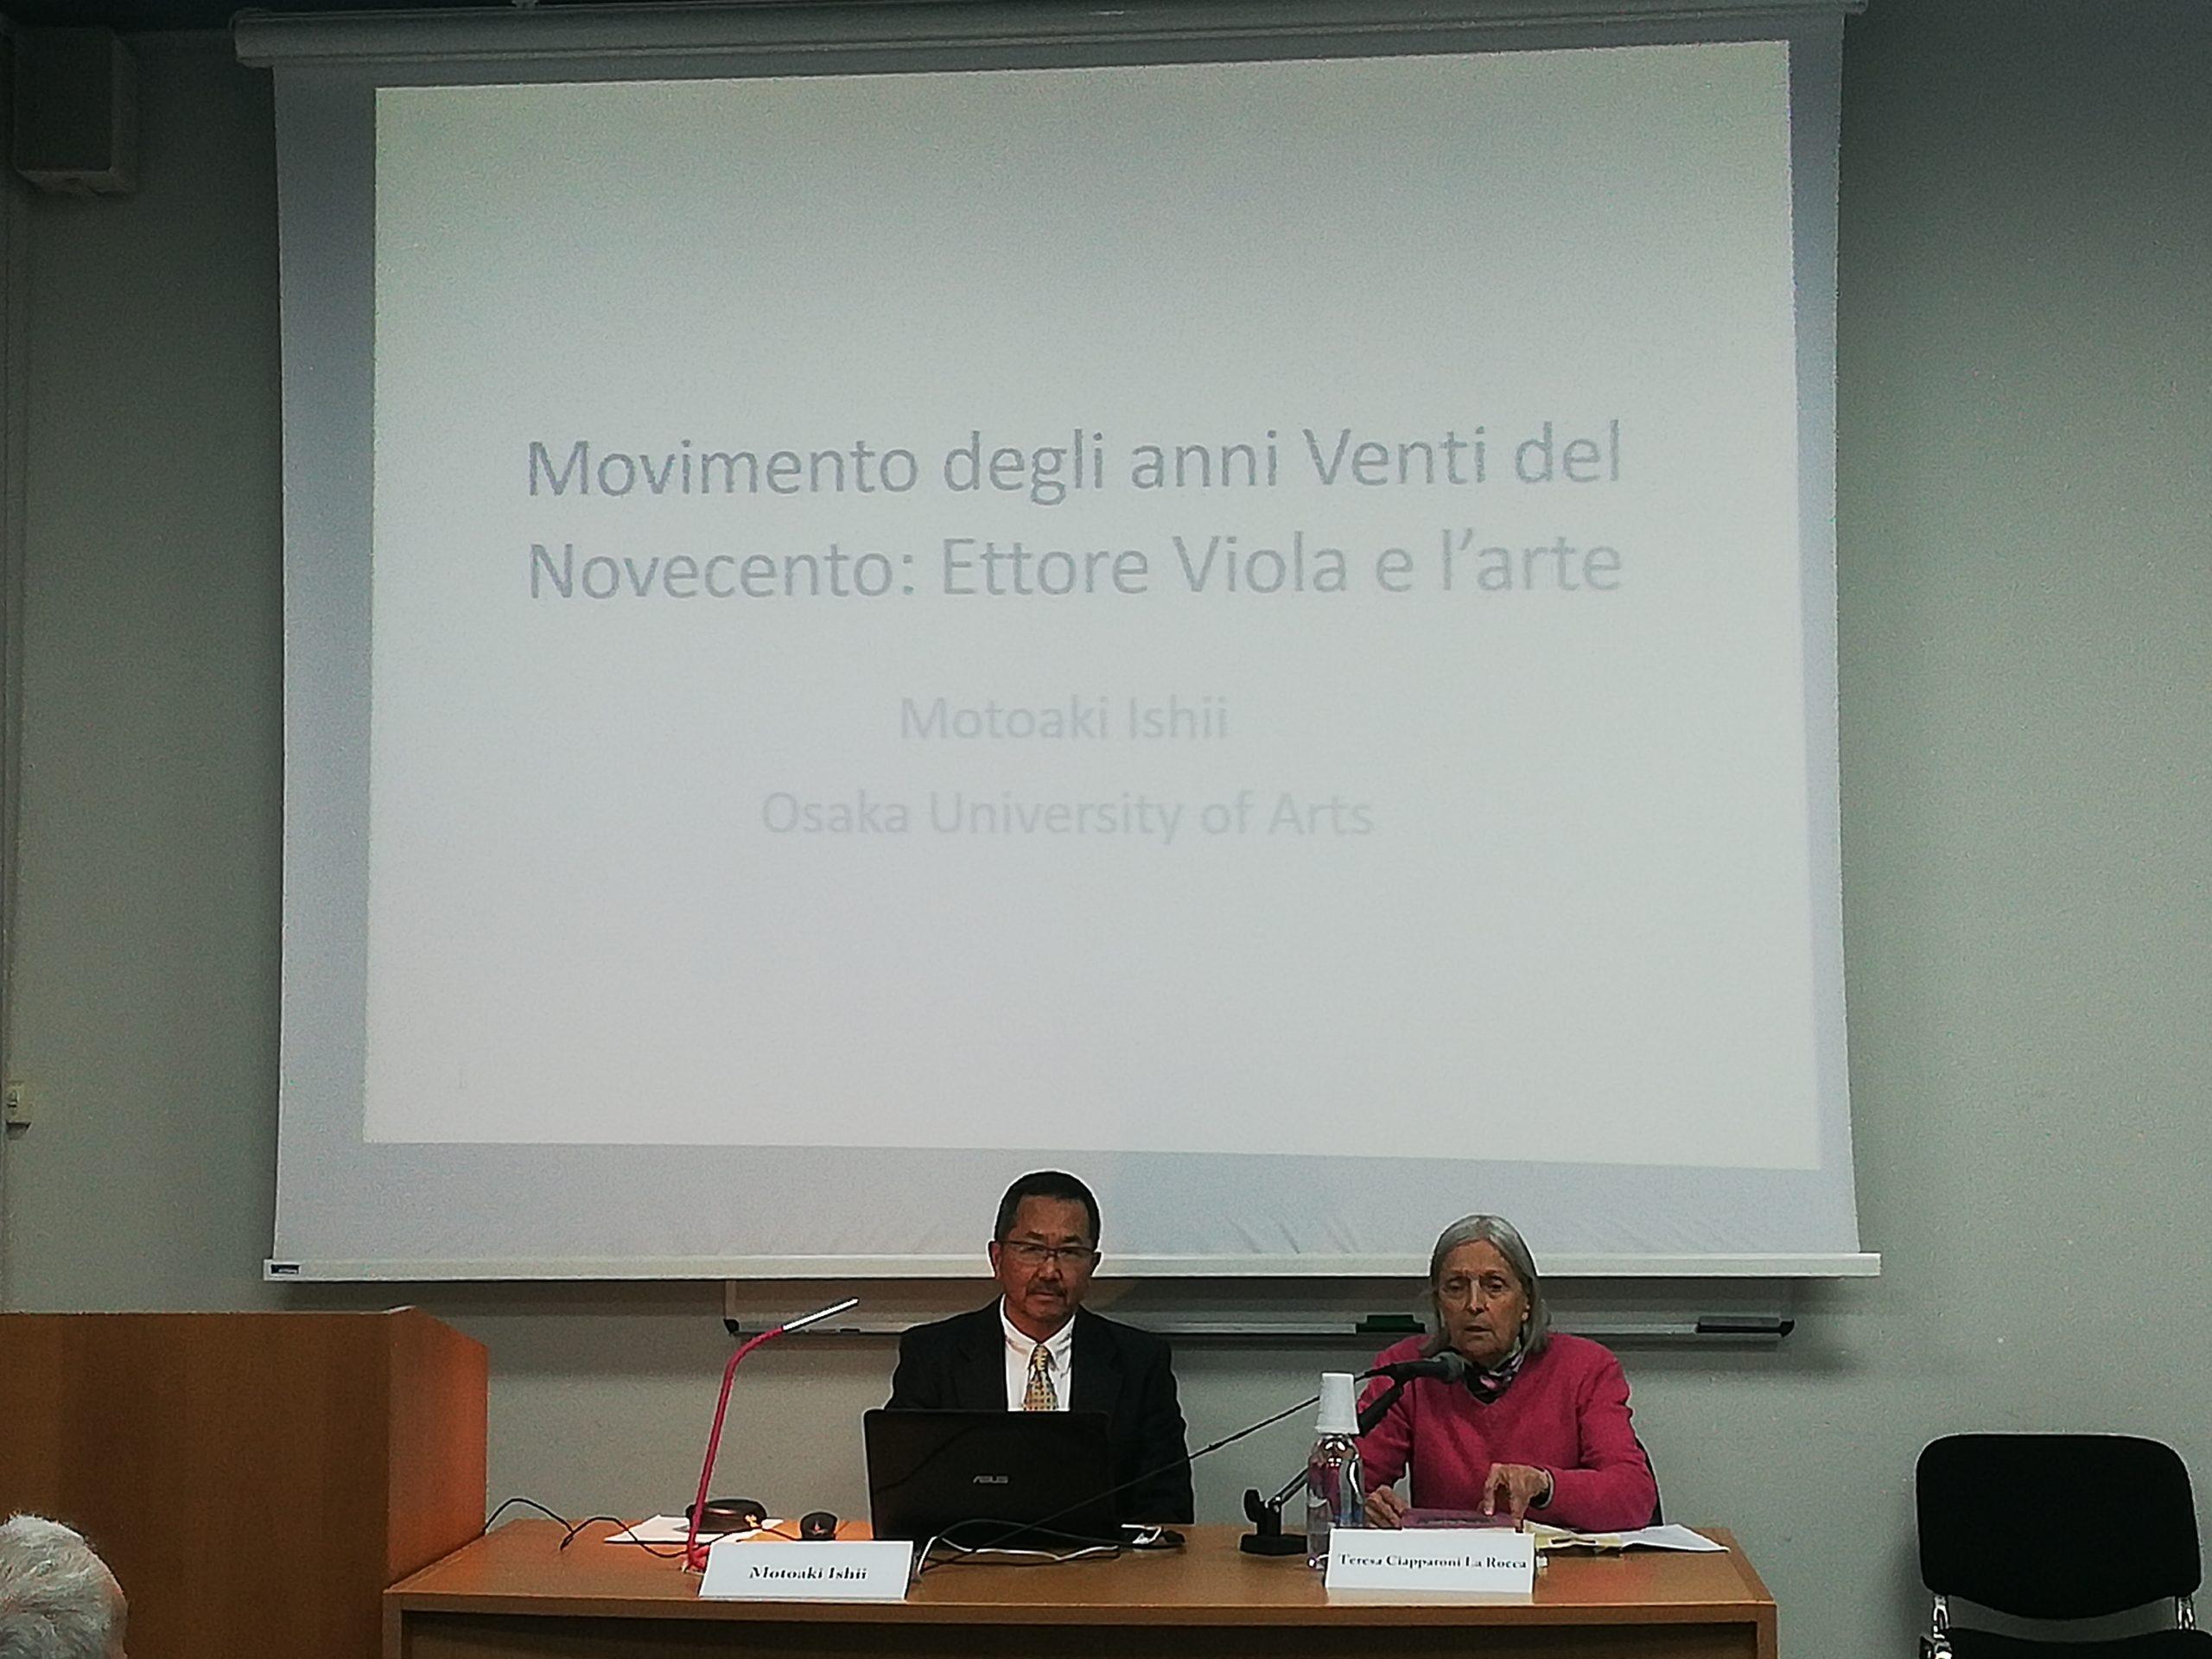 La prof.ssa Teresa Ciapparoni, ISMEO, introduce la conferenza del prof. Motoaki Ishii, Osaka University of Arts.